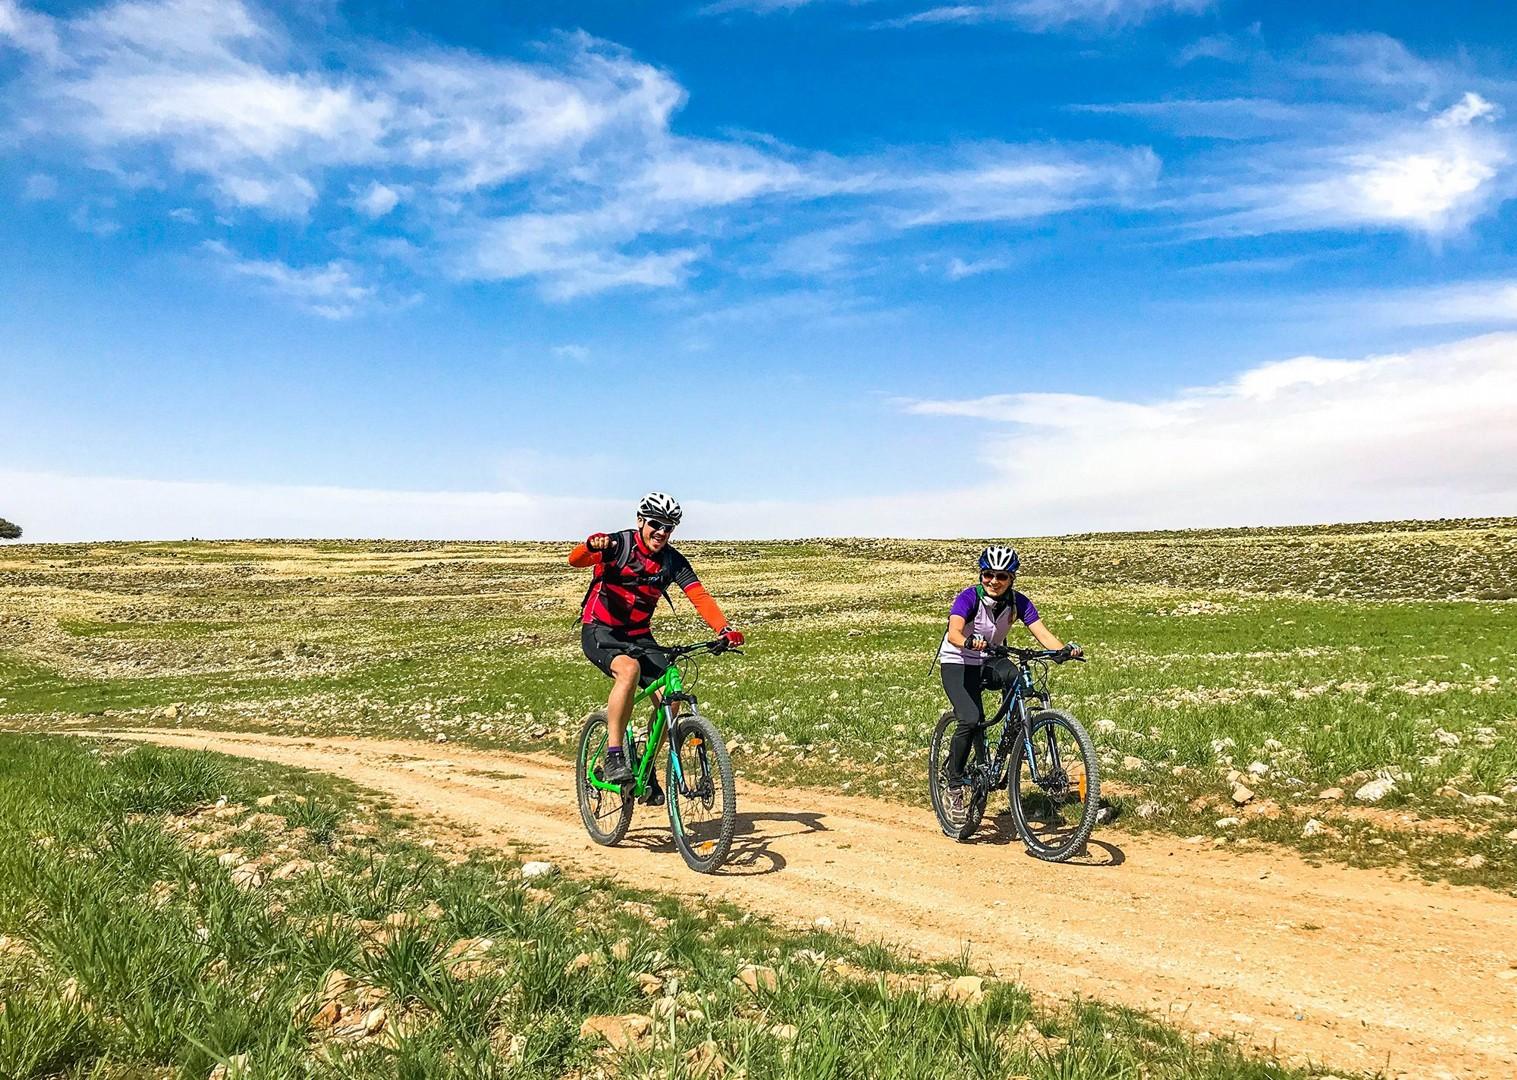 saddle-skedaddle-jordan-cycling-holiday-adventure-trip.jpg - NEW! Jordan - Petra, Wadi Rum & the Dead Sea - Cycling Adventures